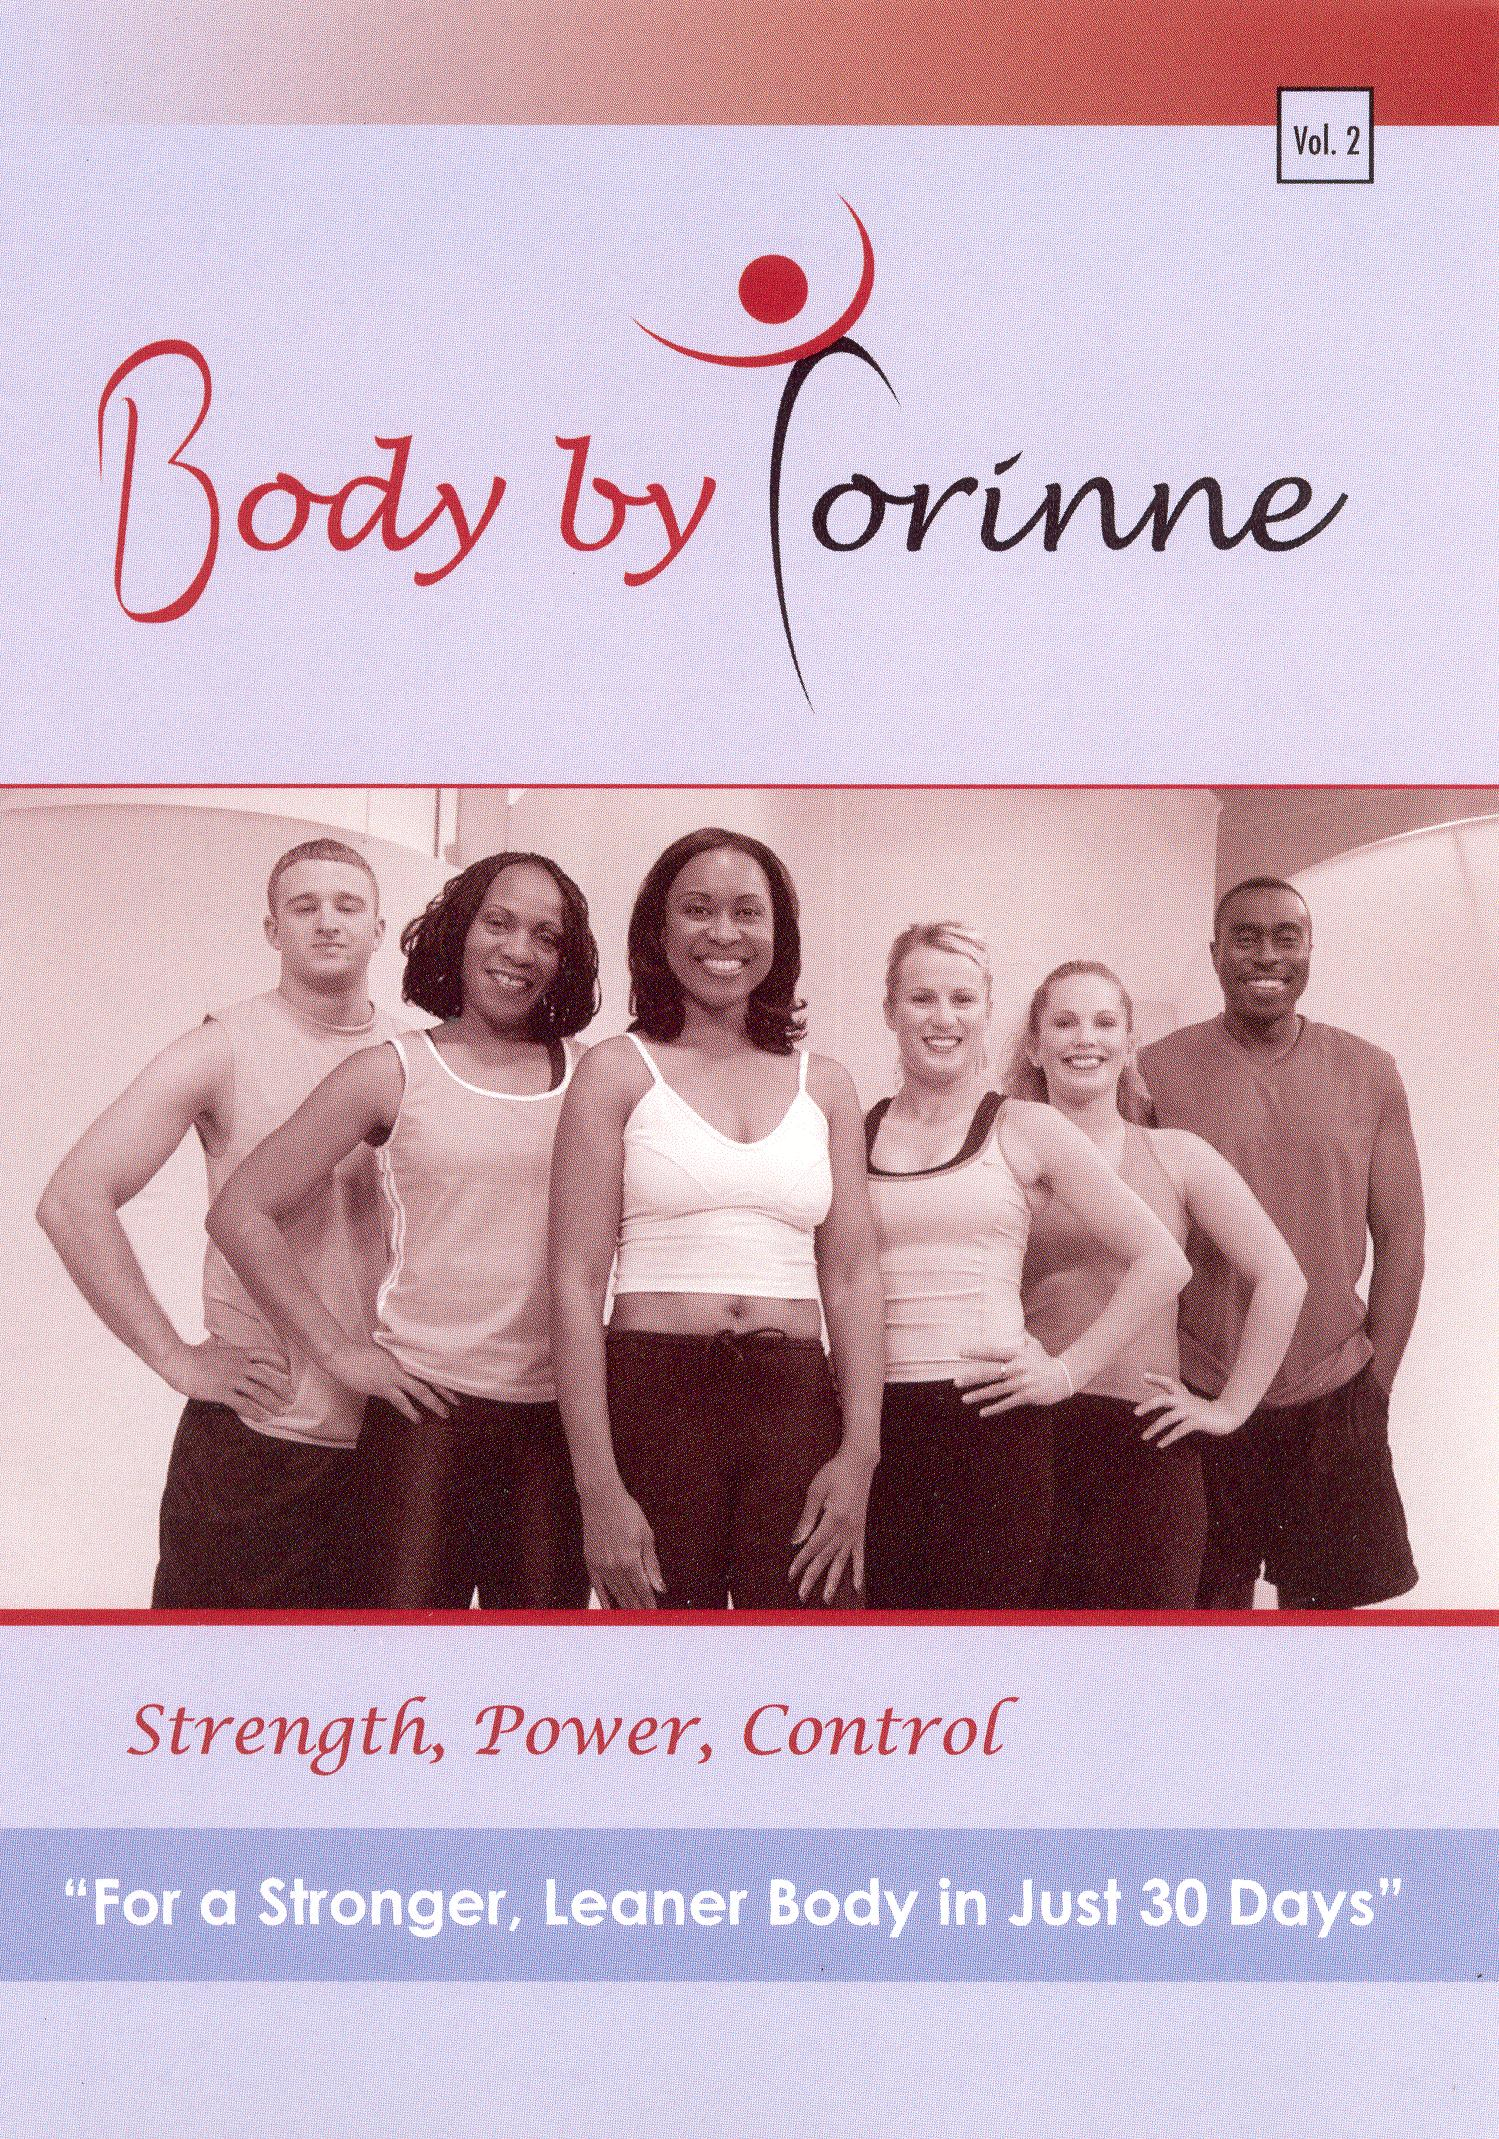 Body By Corinne, Vol. 2